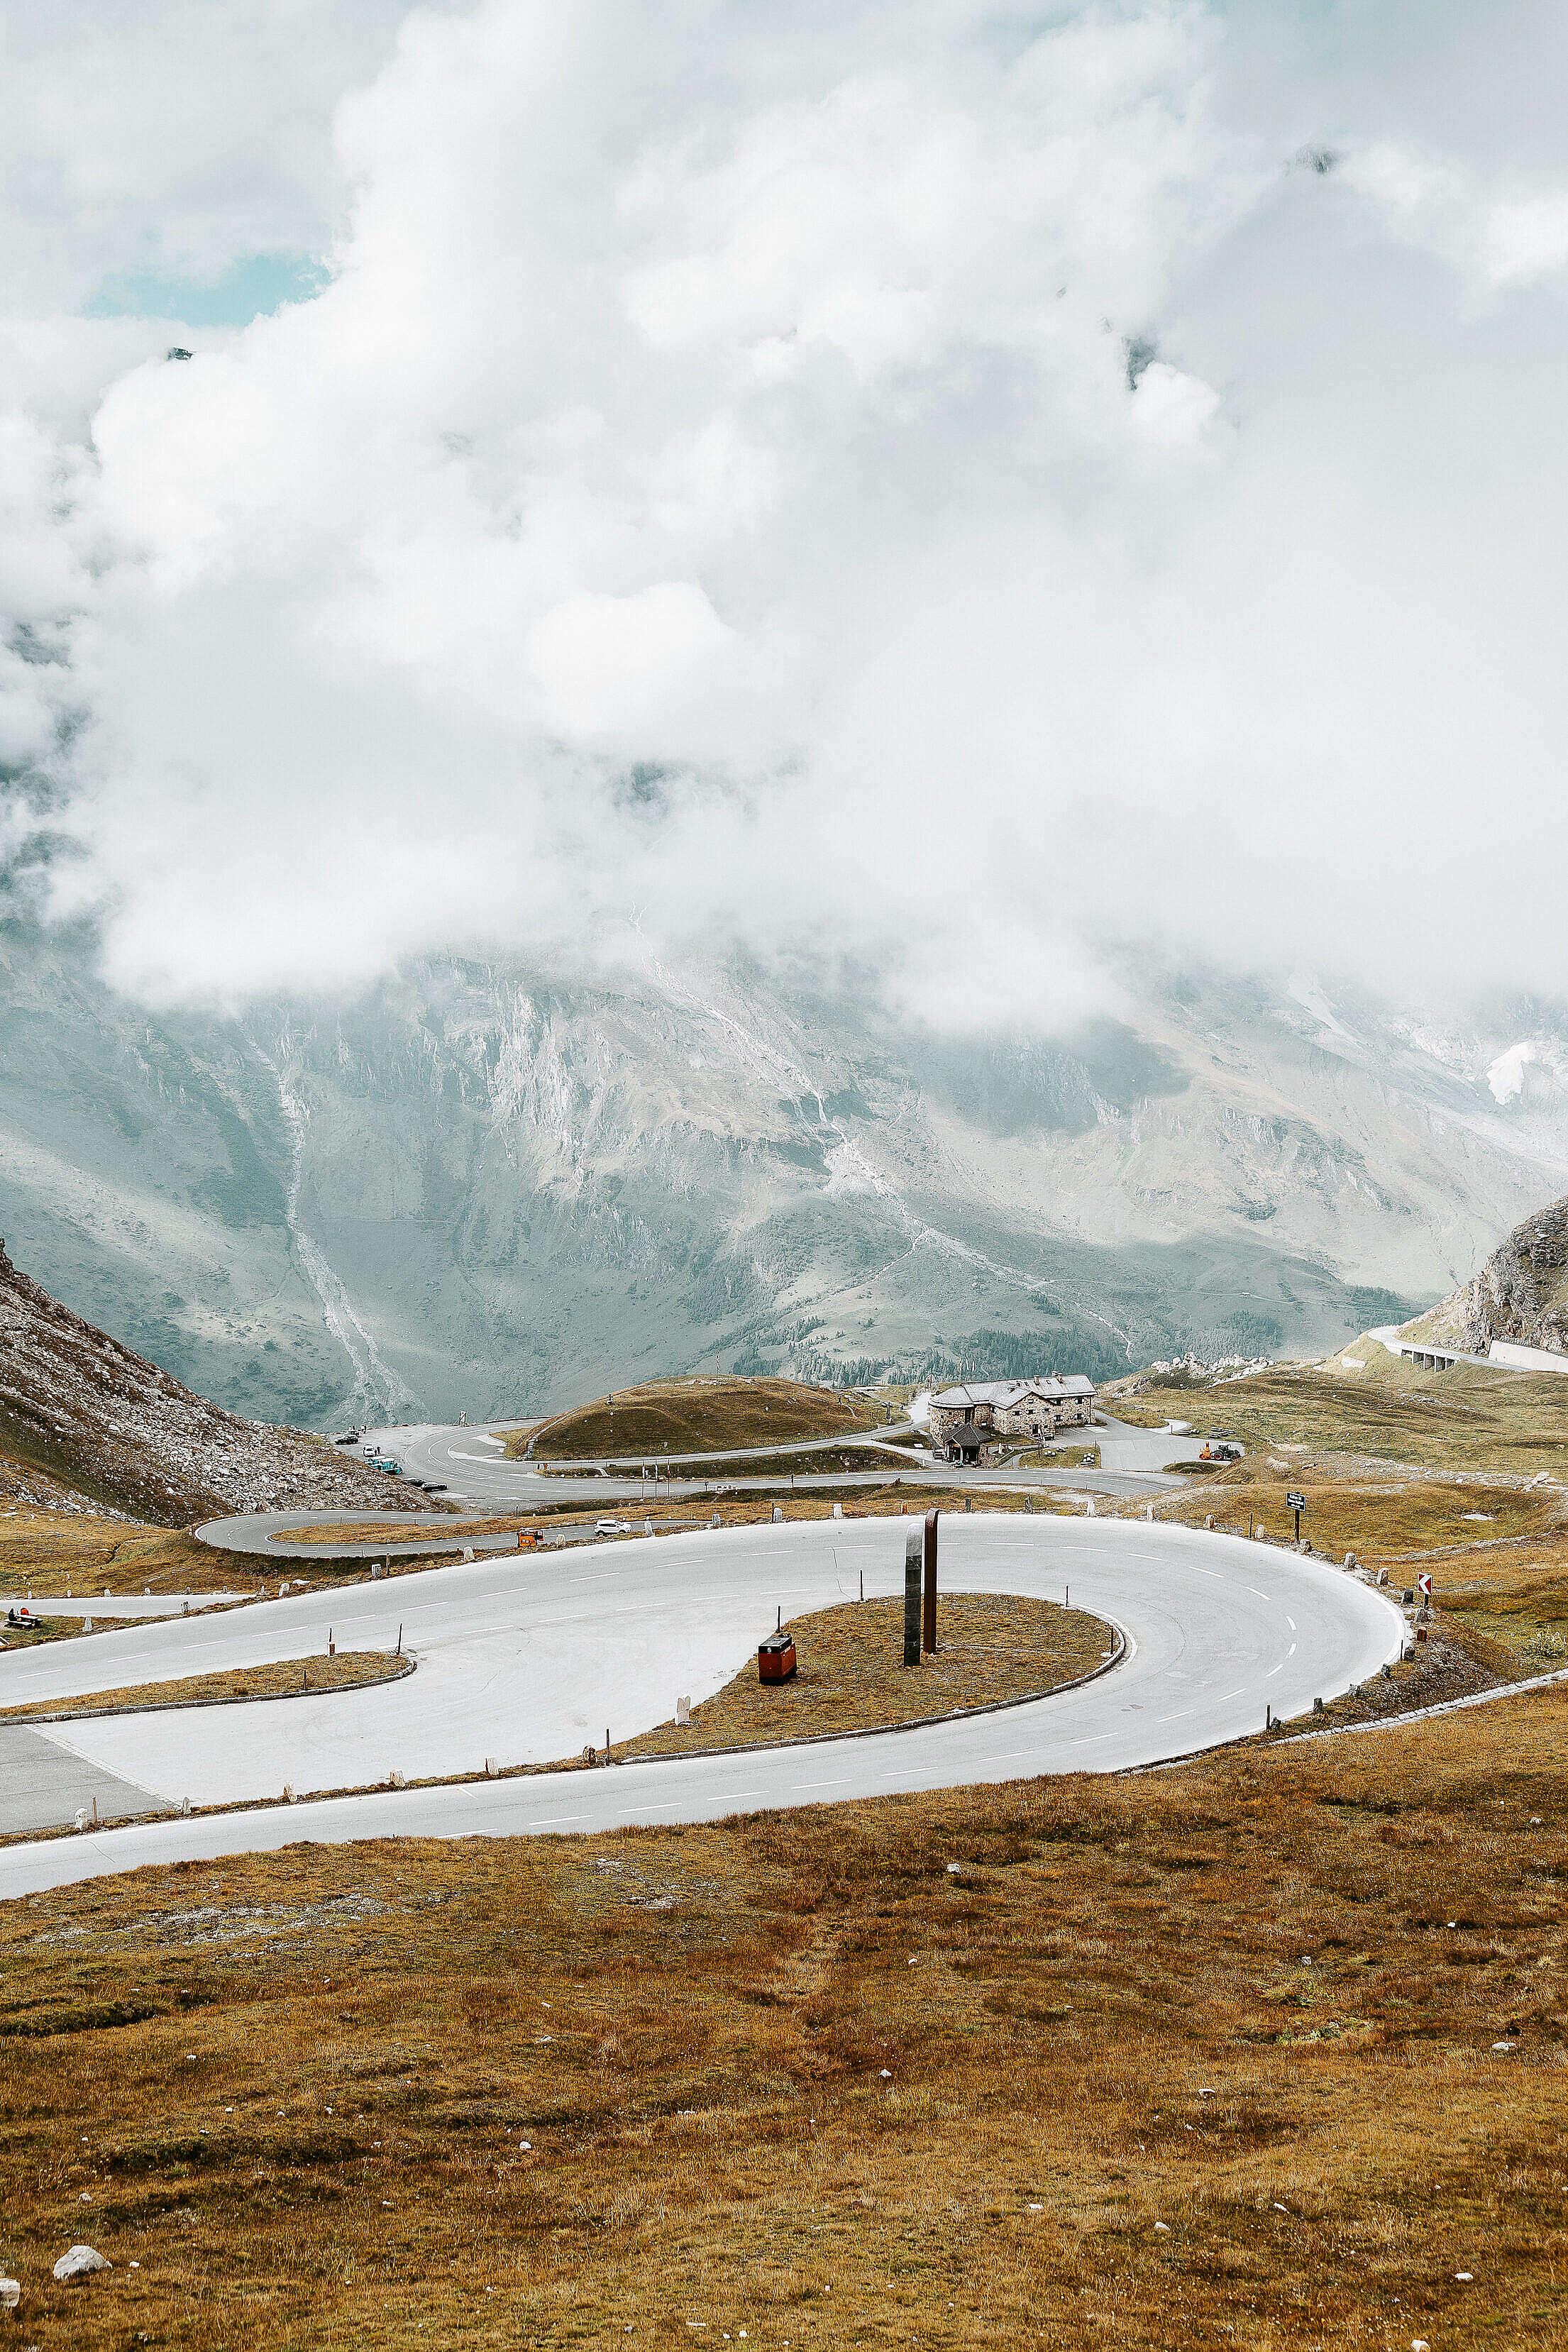 Hairpin Turn on Grossglockner High Alpine Road Free Stock Photo